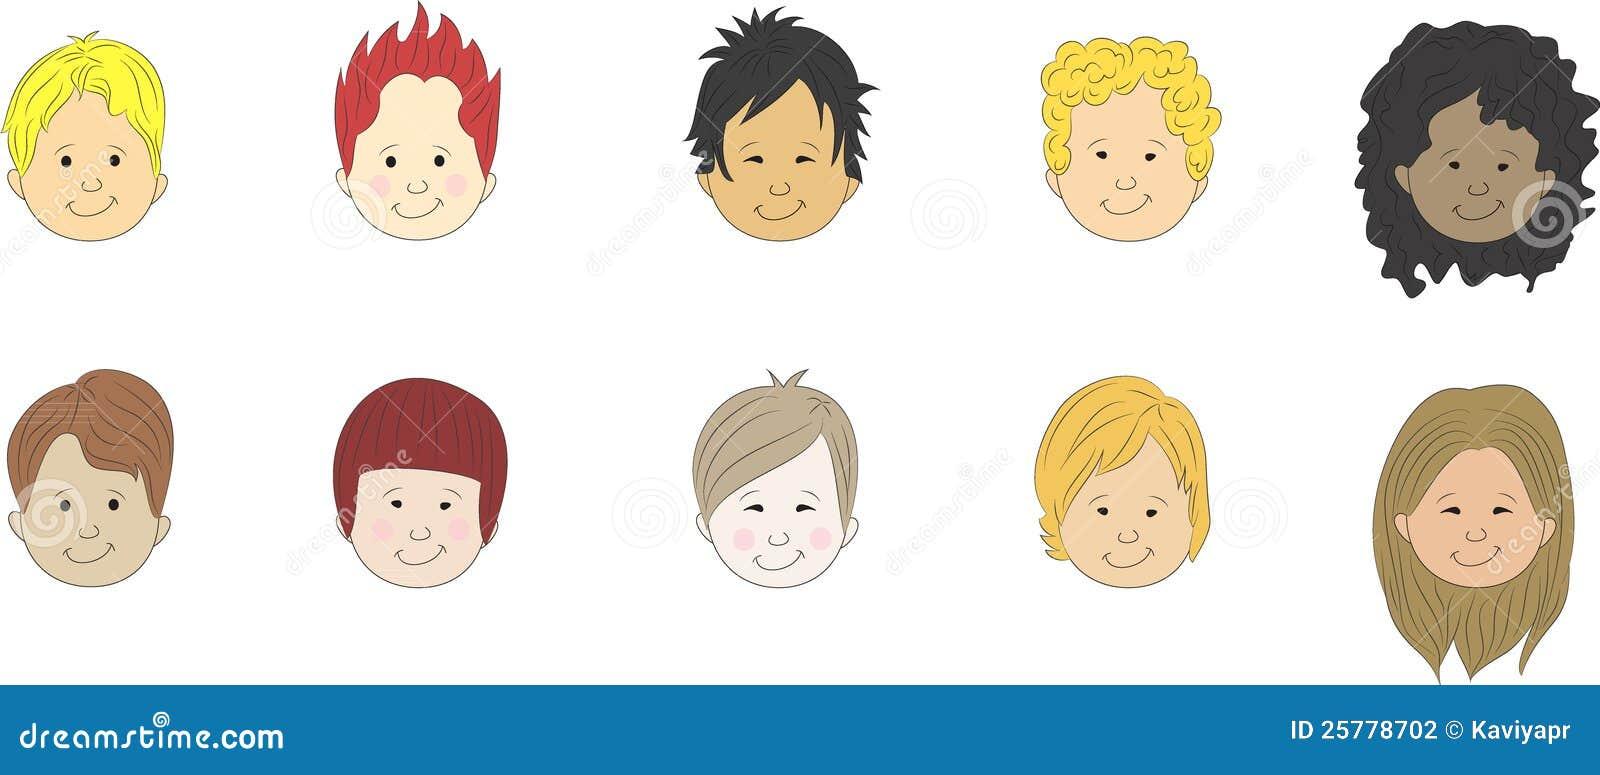 Boys Cartoon Faces Stock Photography Image 25778702